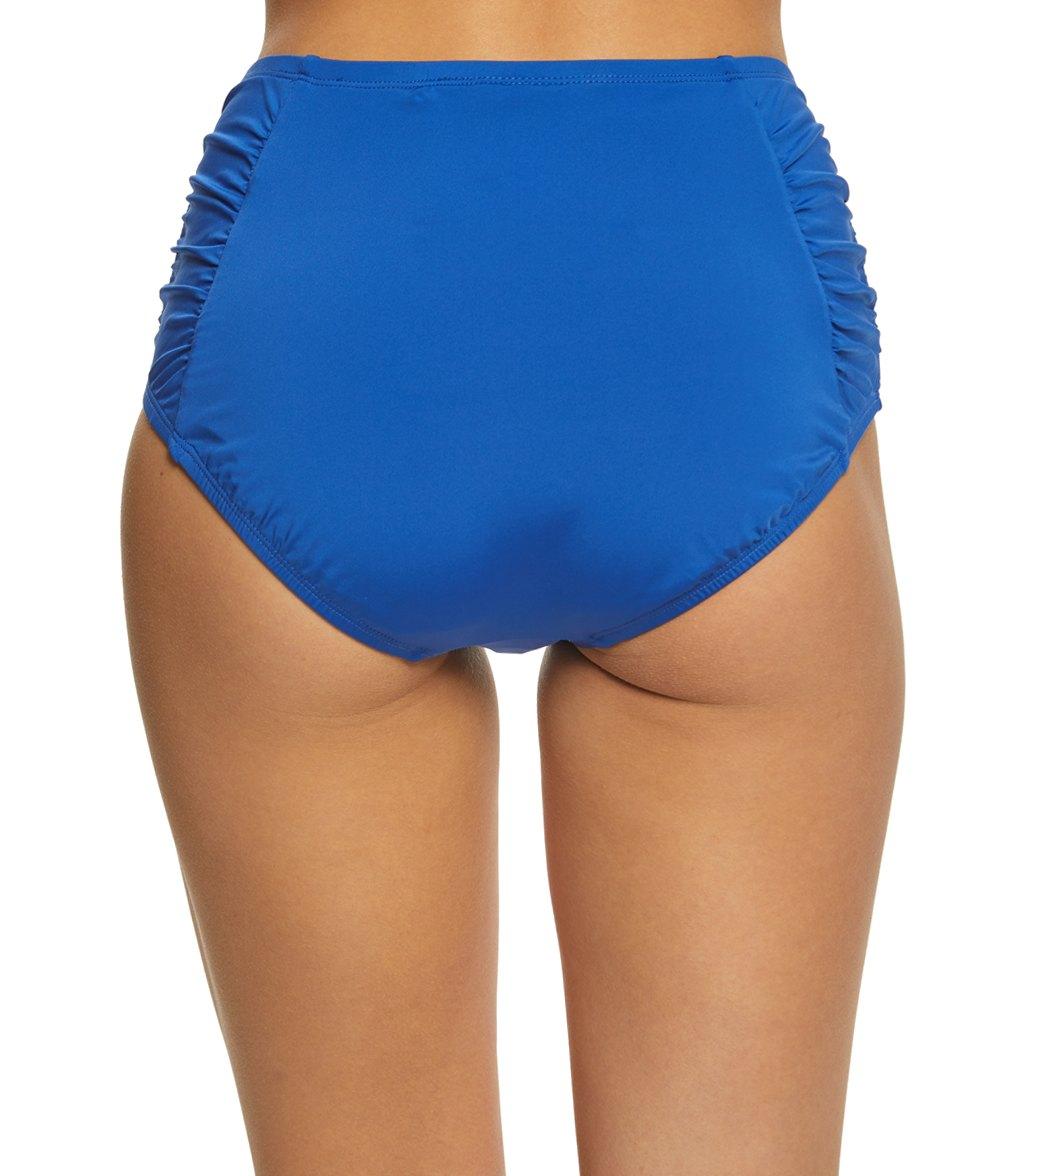 87f40f42b85 Jantzen Signature Solid High Waist Bikini Bottom at SwimOutlet.com ...